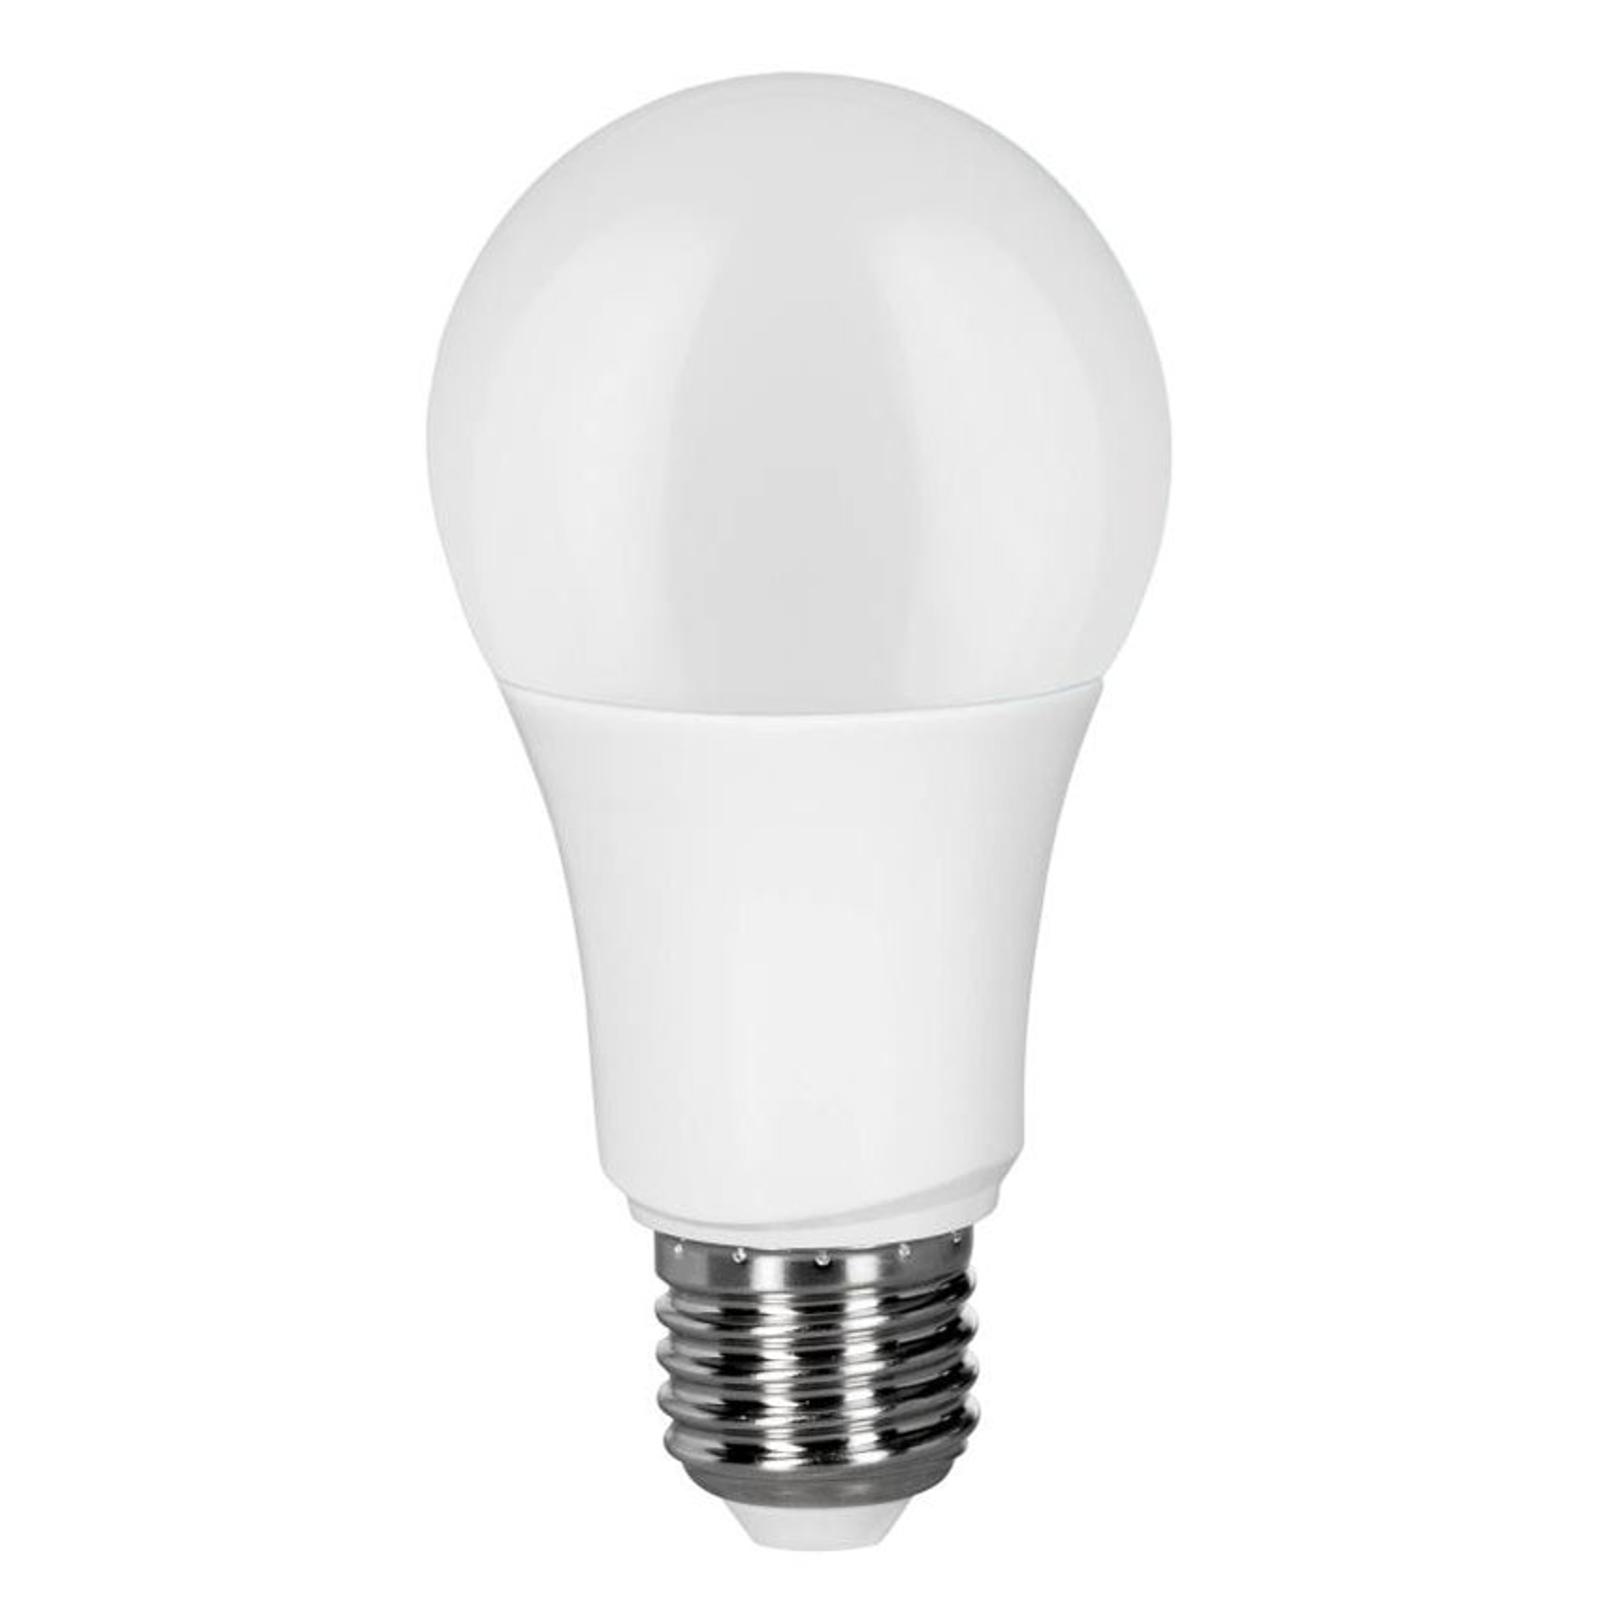 Müller Licht tint dimming LED-Lampe E27, 9W 2.700K